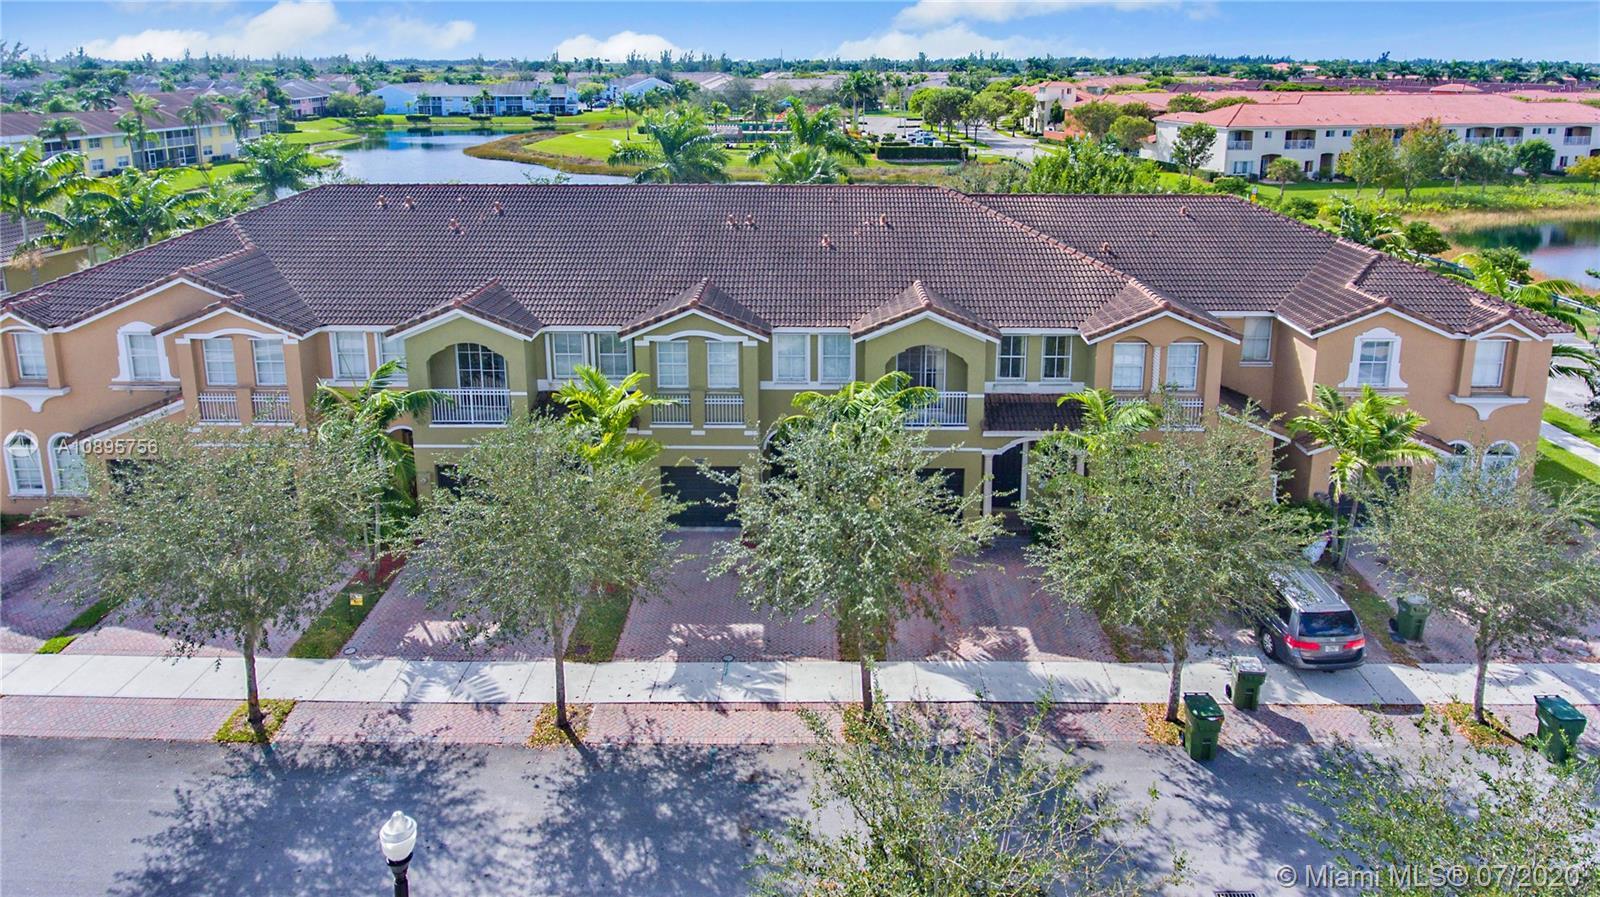 2470 SE 15th Ct #0 Property Photo - Homestead, FL real estate listing